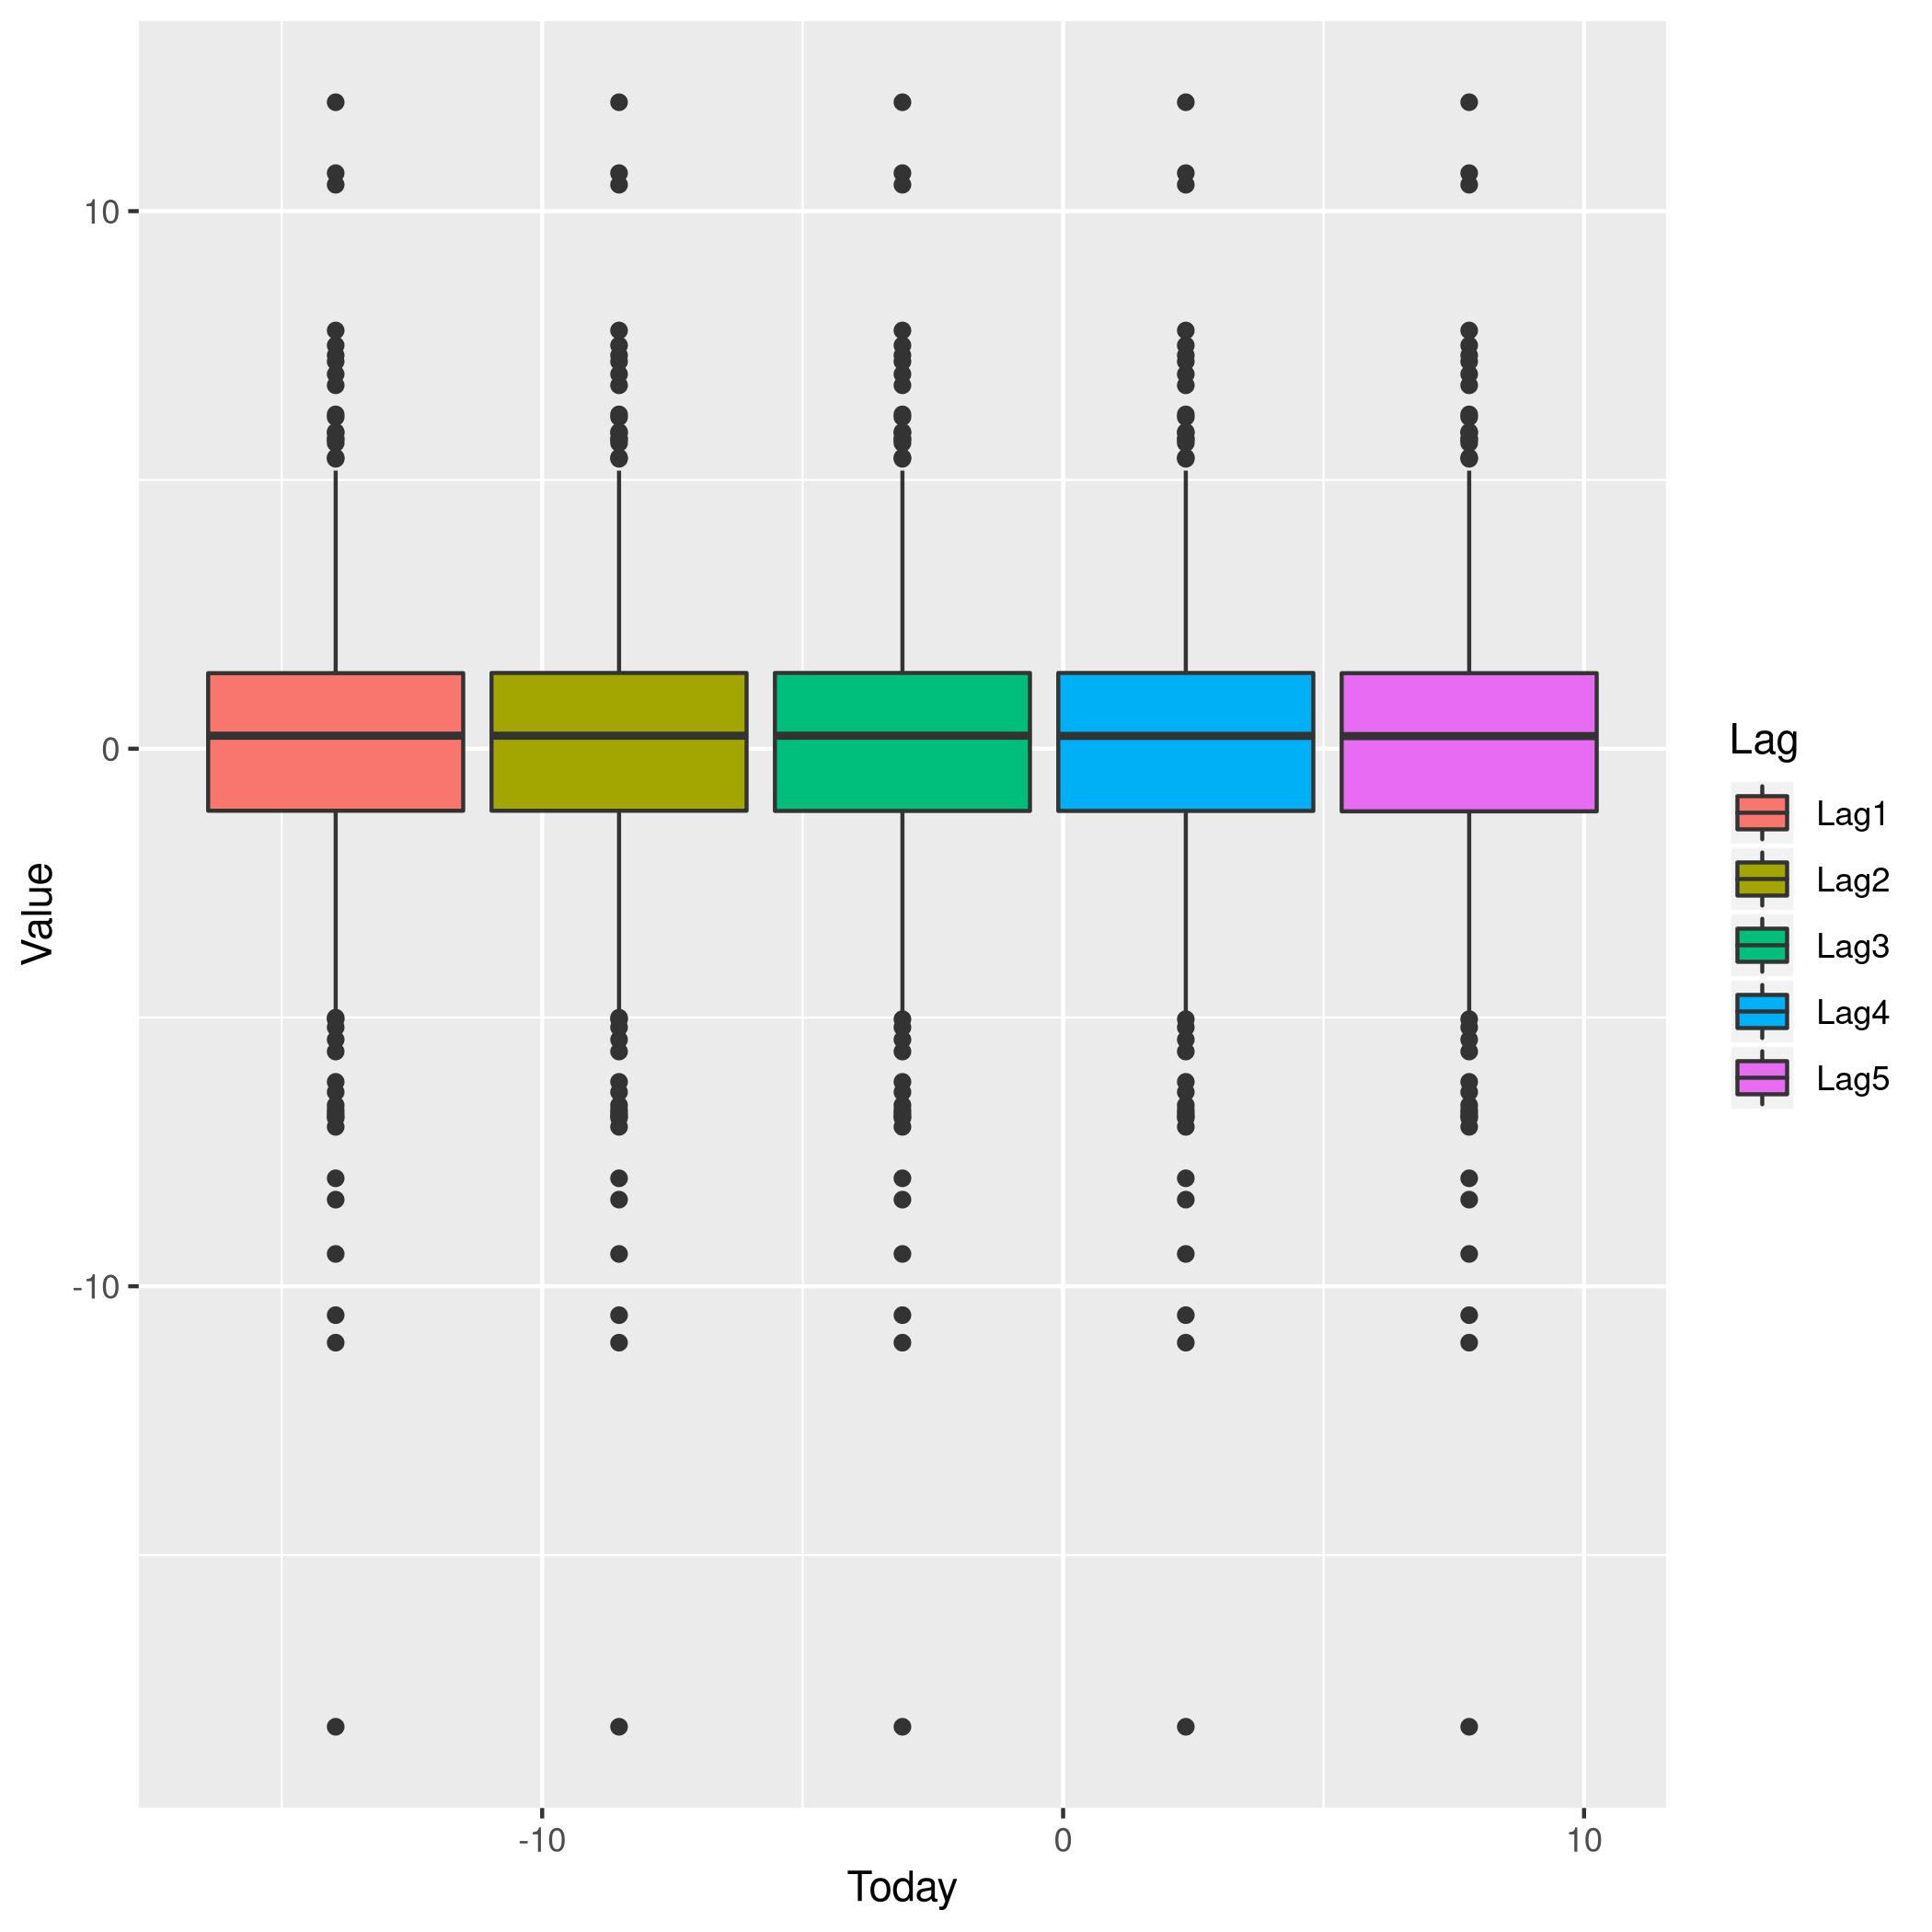 Figure 4: More box plots